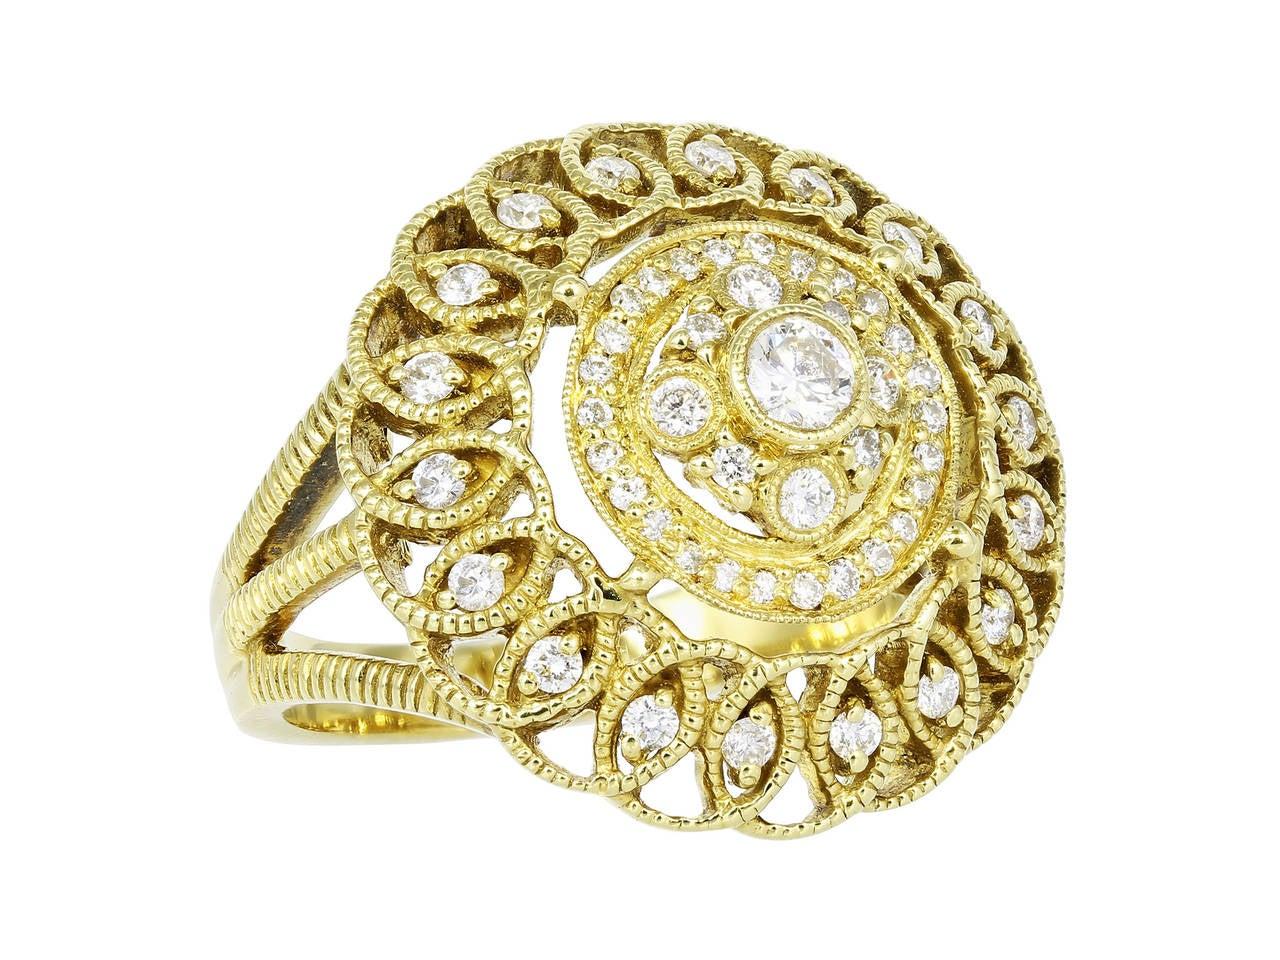 Leslie greene diamond and gold ring for sale at 1stdibs for Leslie greene jewelry designer